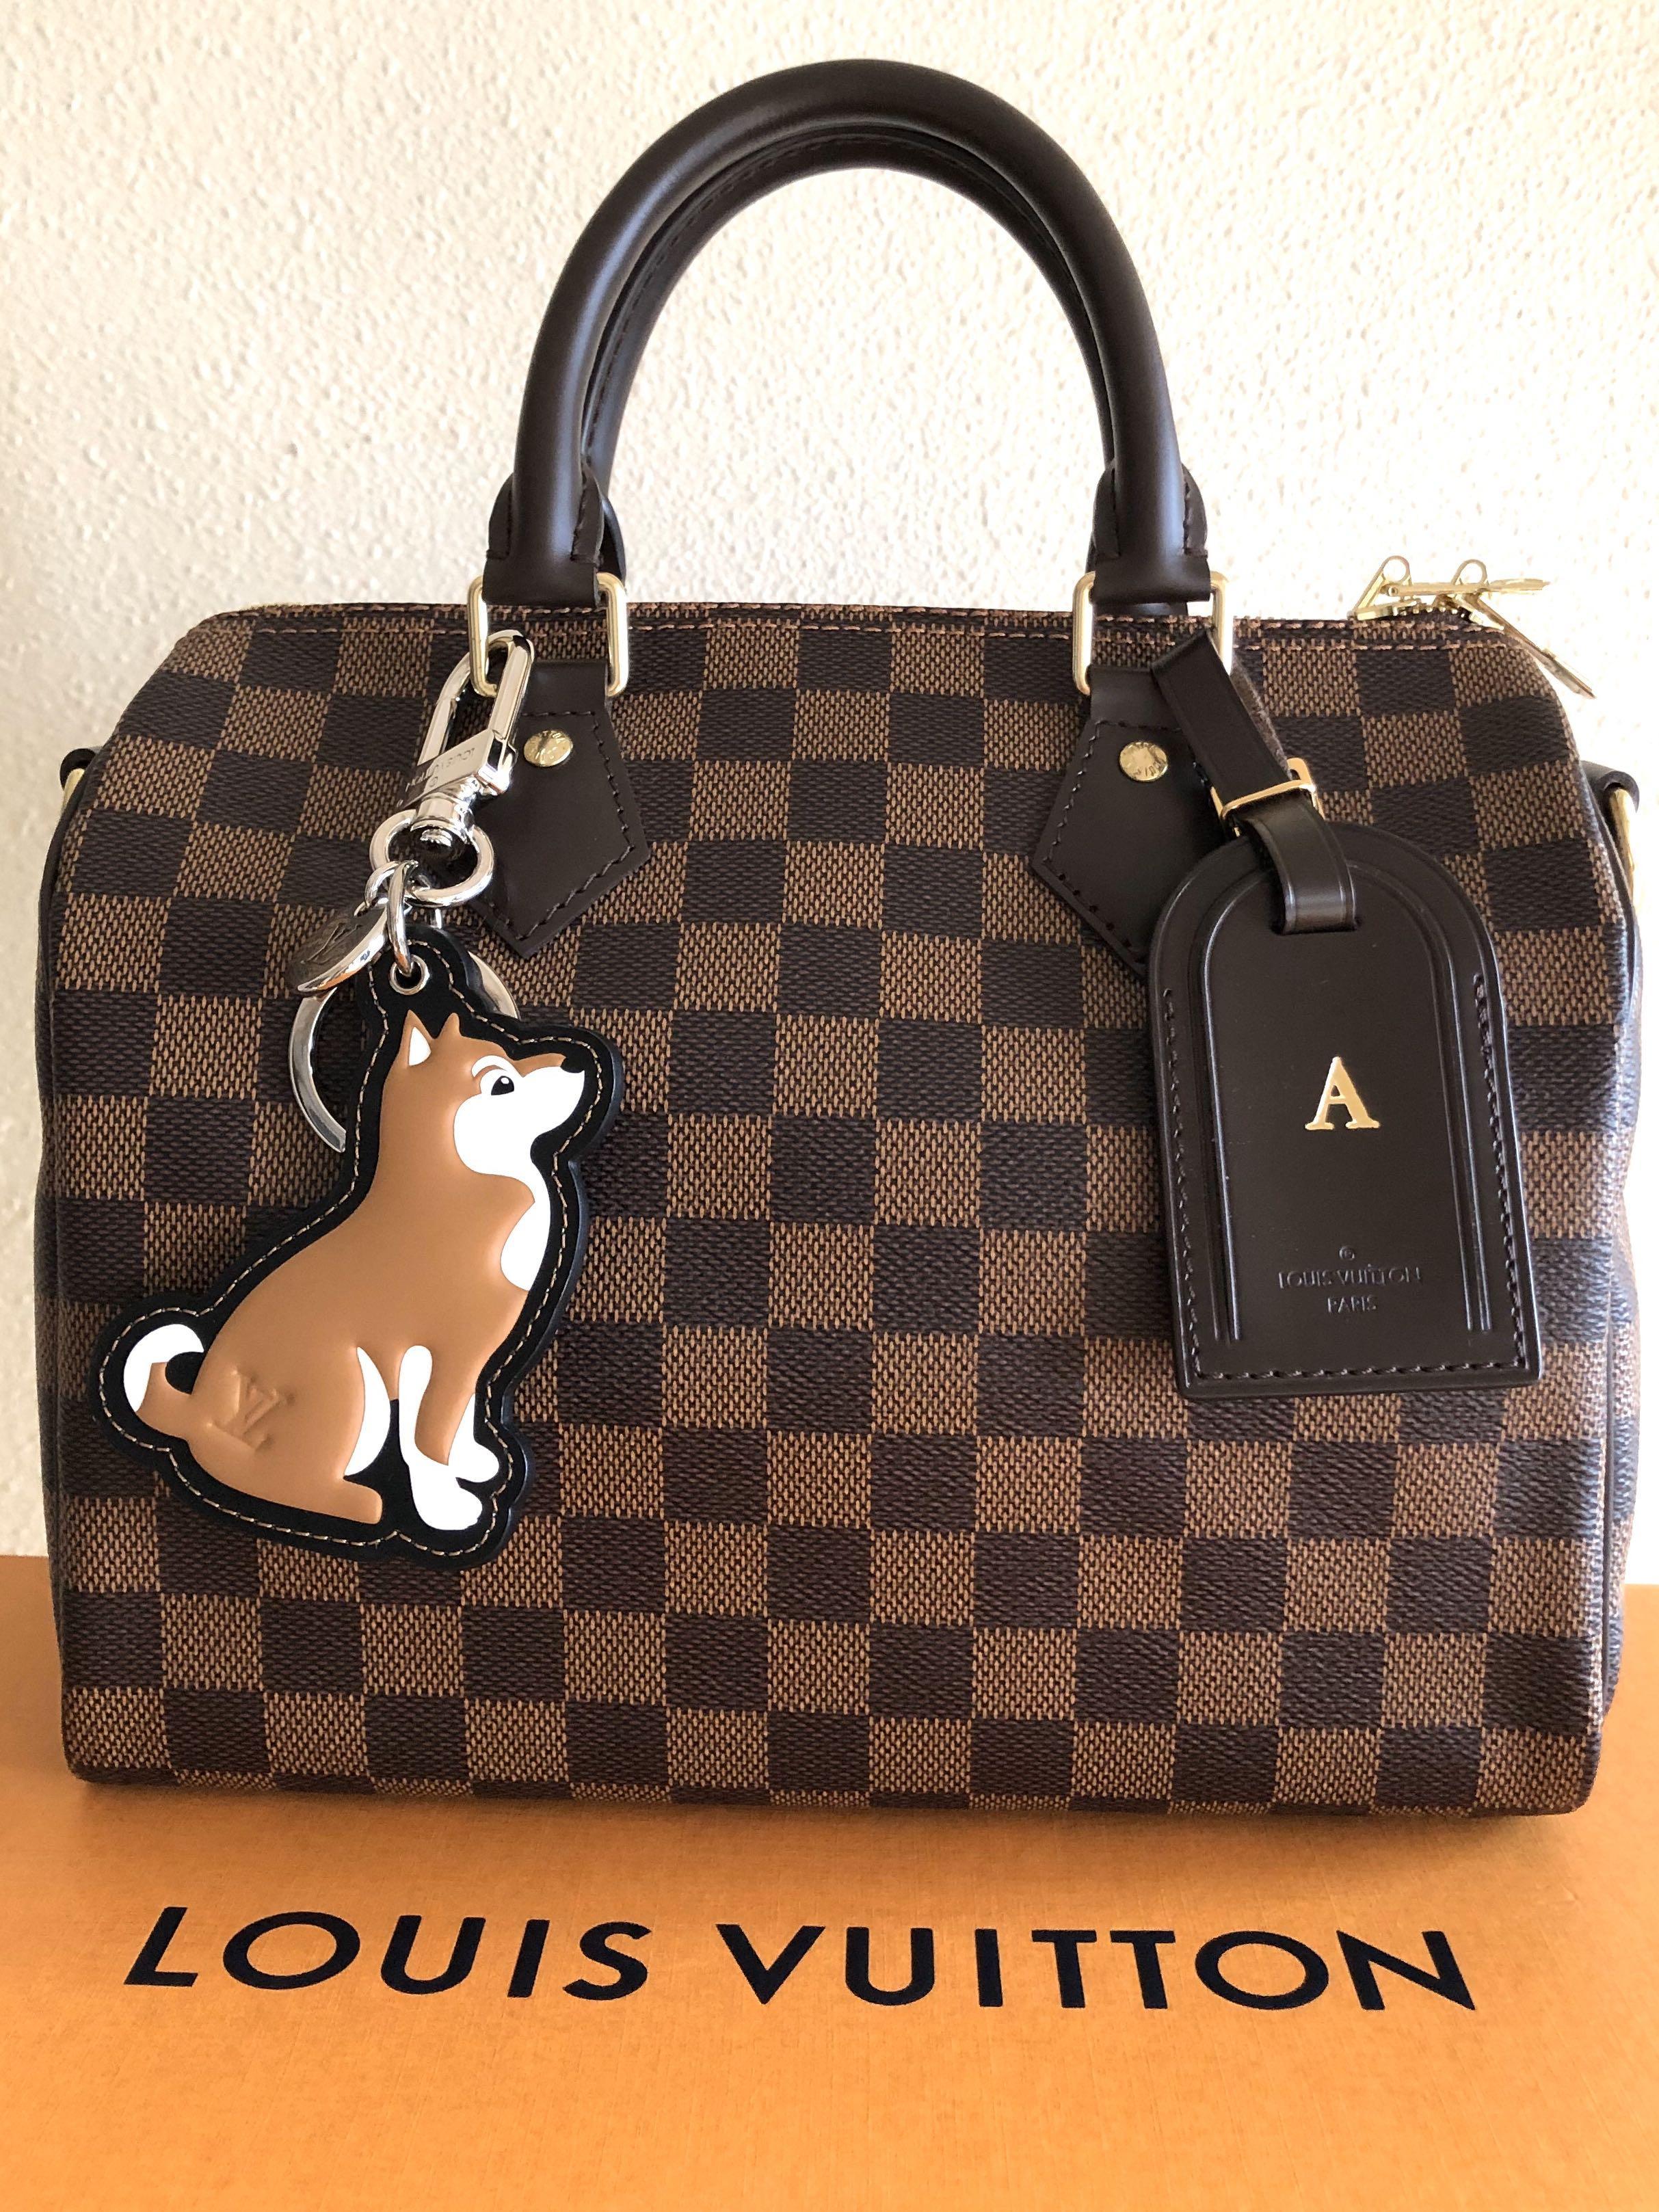 Louis Vuitton Speedy B25 with Shiba Dog Charm & Luggage Tag! SOLD!!!